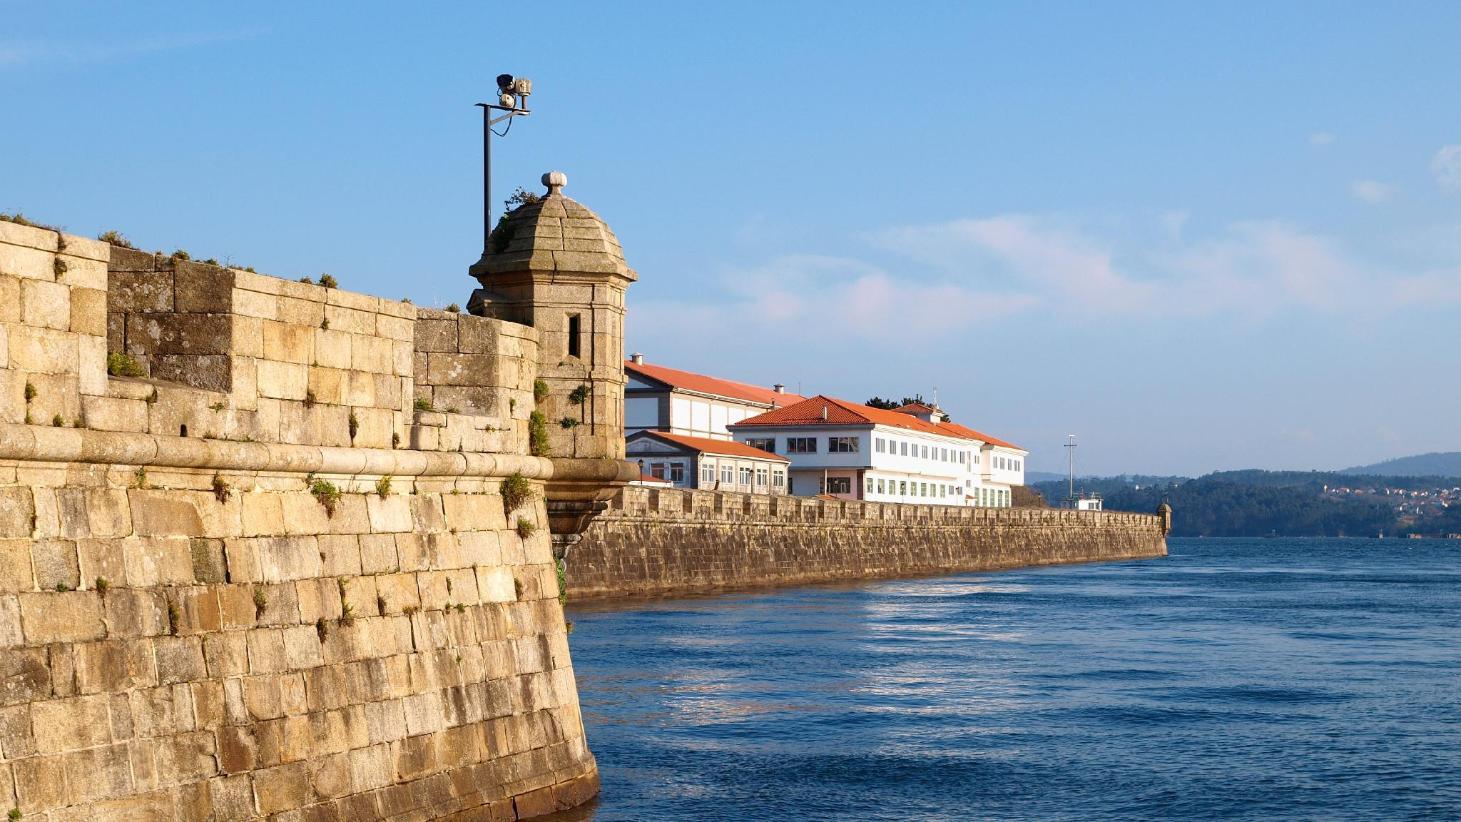 30 Best Ferrol Hotels In 2020 Great Savings Reviews Of Hotels